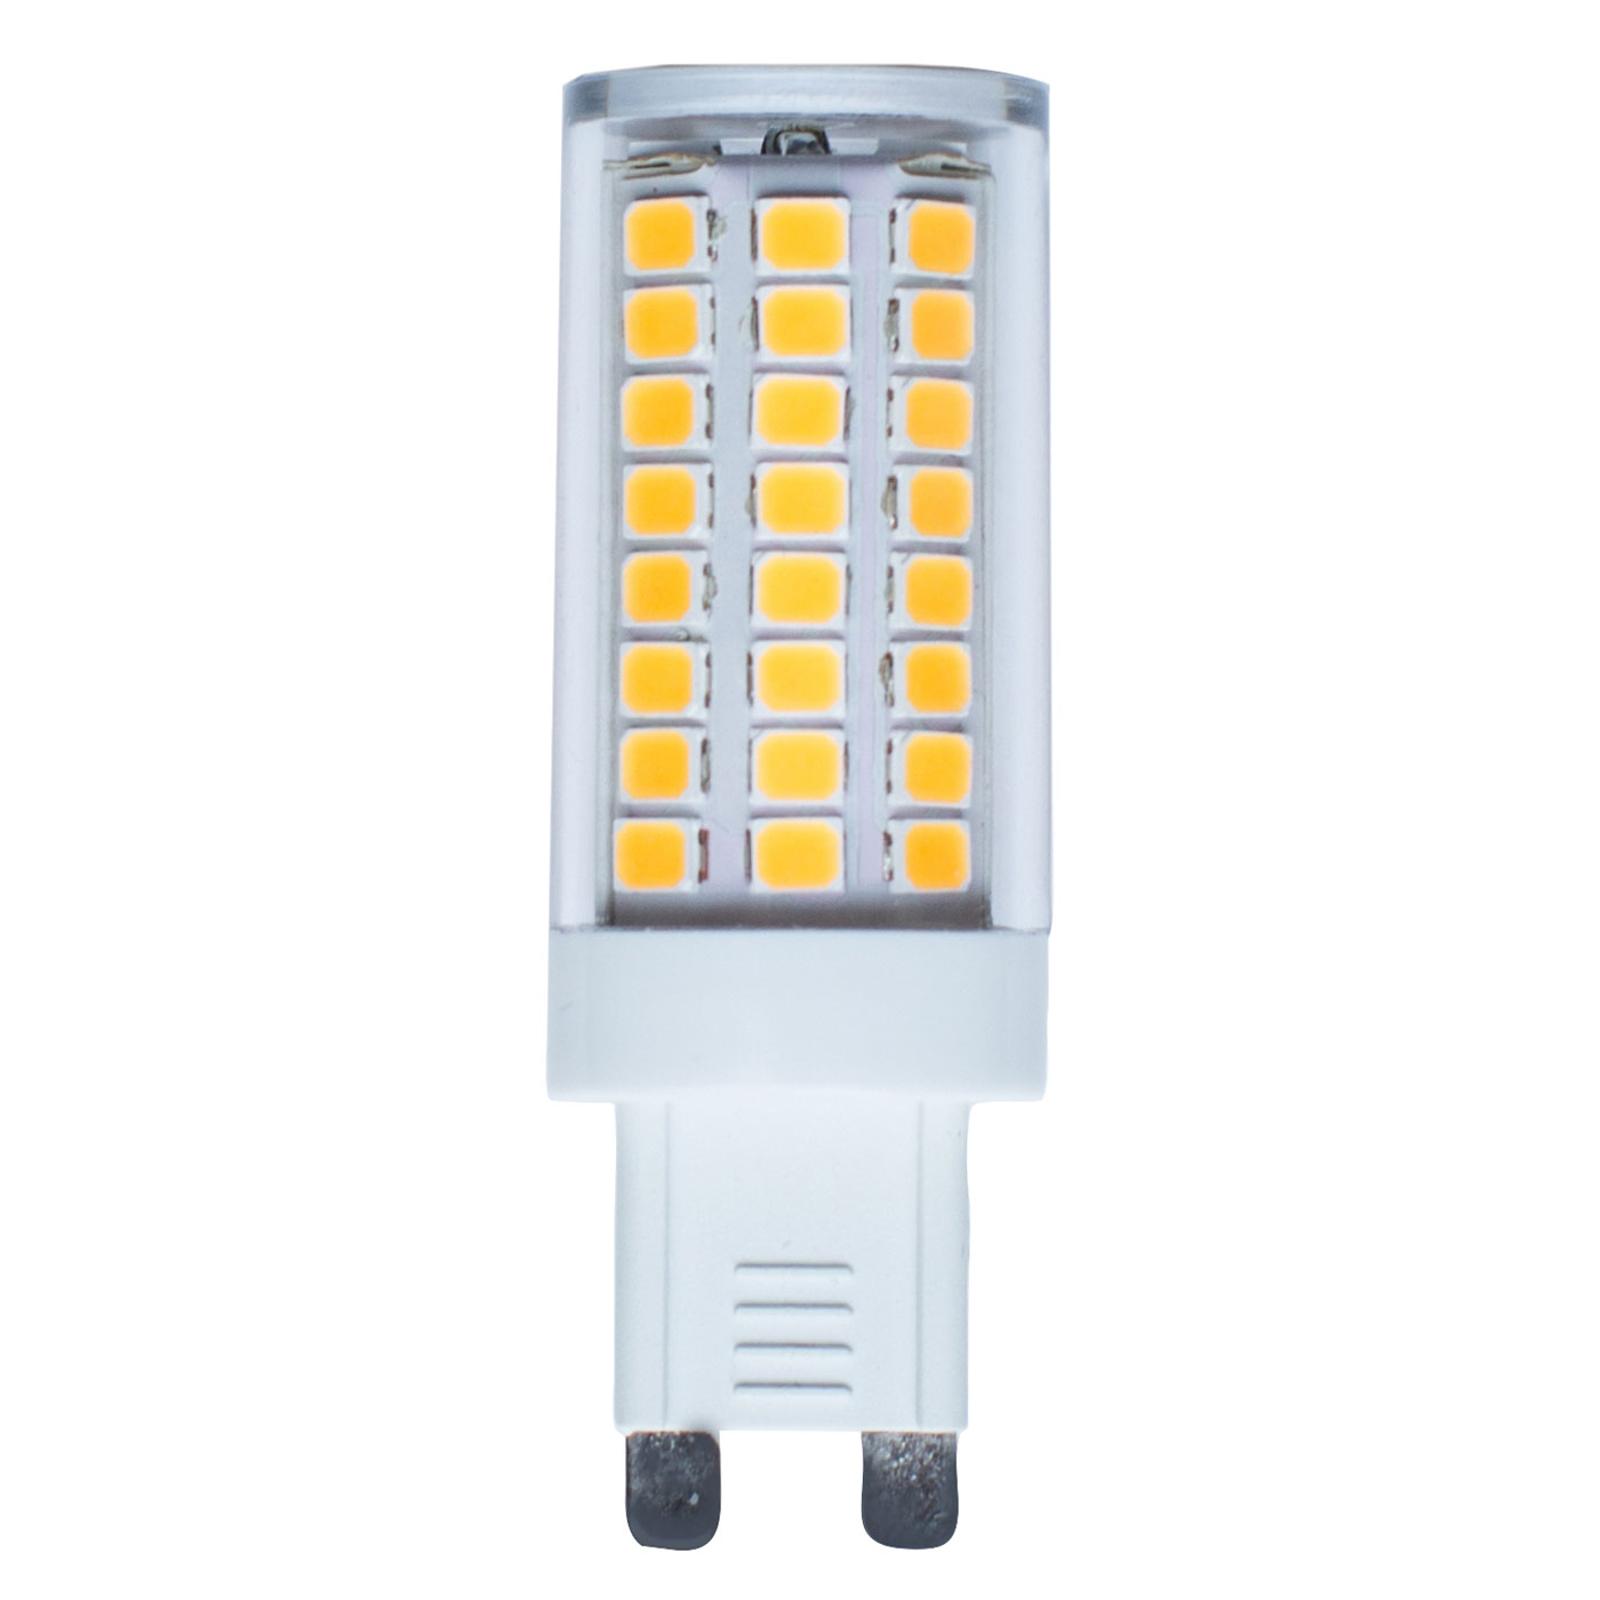 LED-stiftpære G9 4,8 W 2800K 600lm